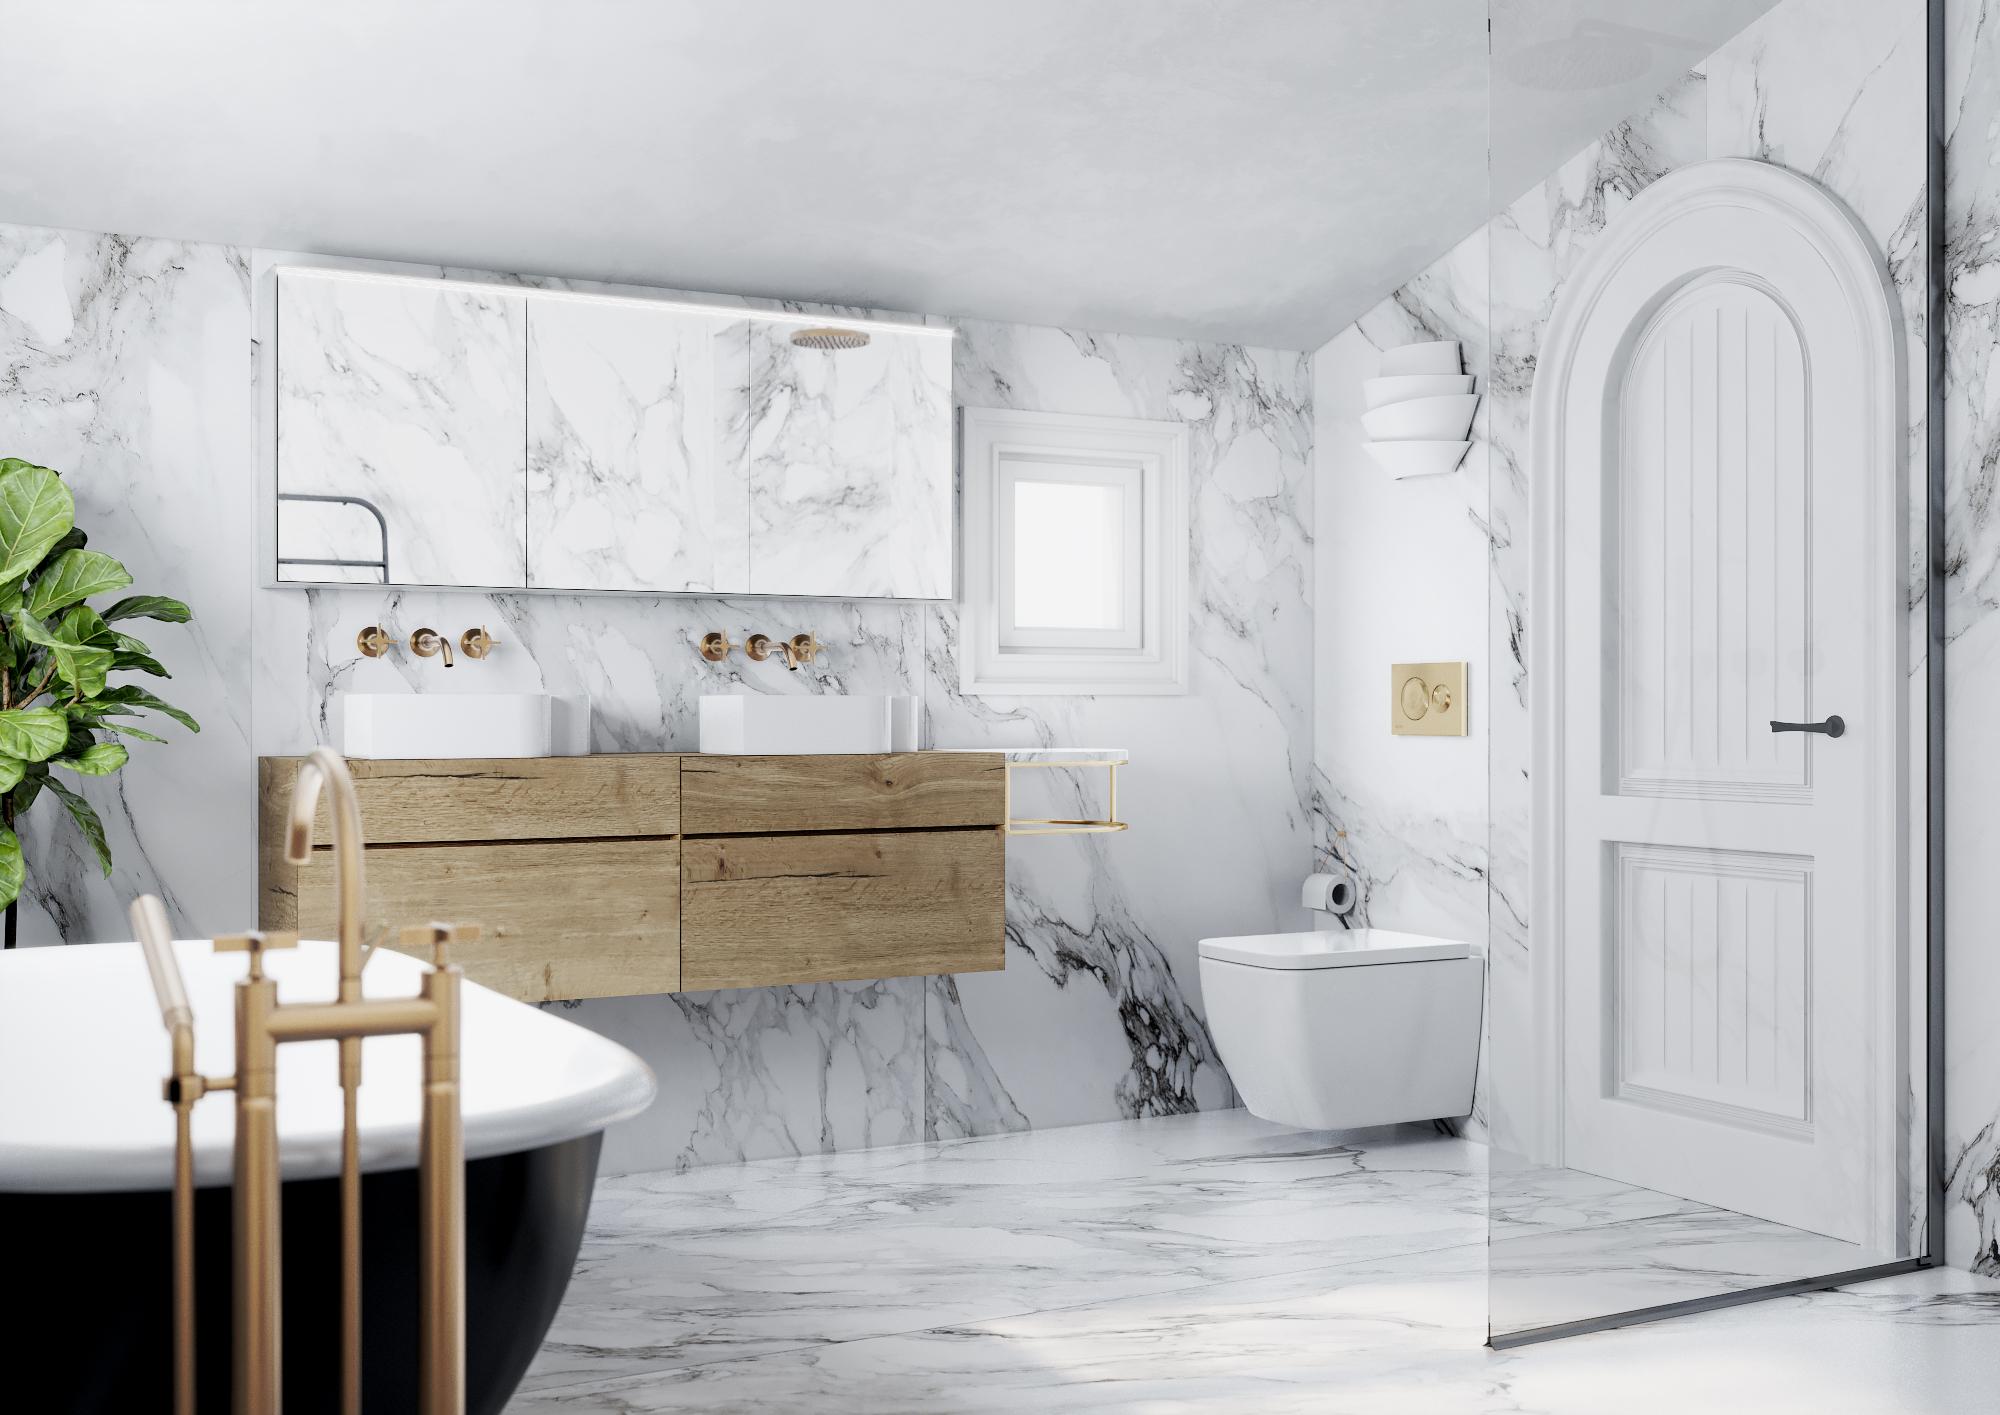 Bathroom_Second_View03_27.07.2019.jpg